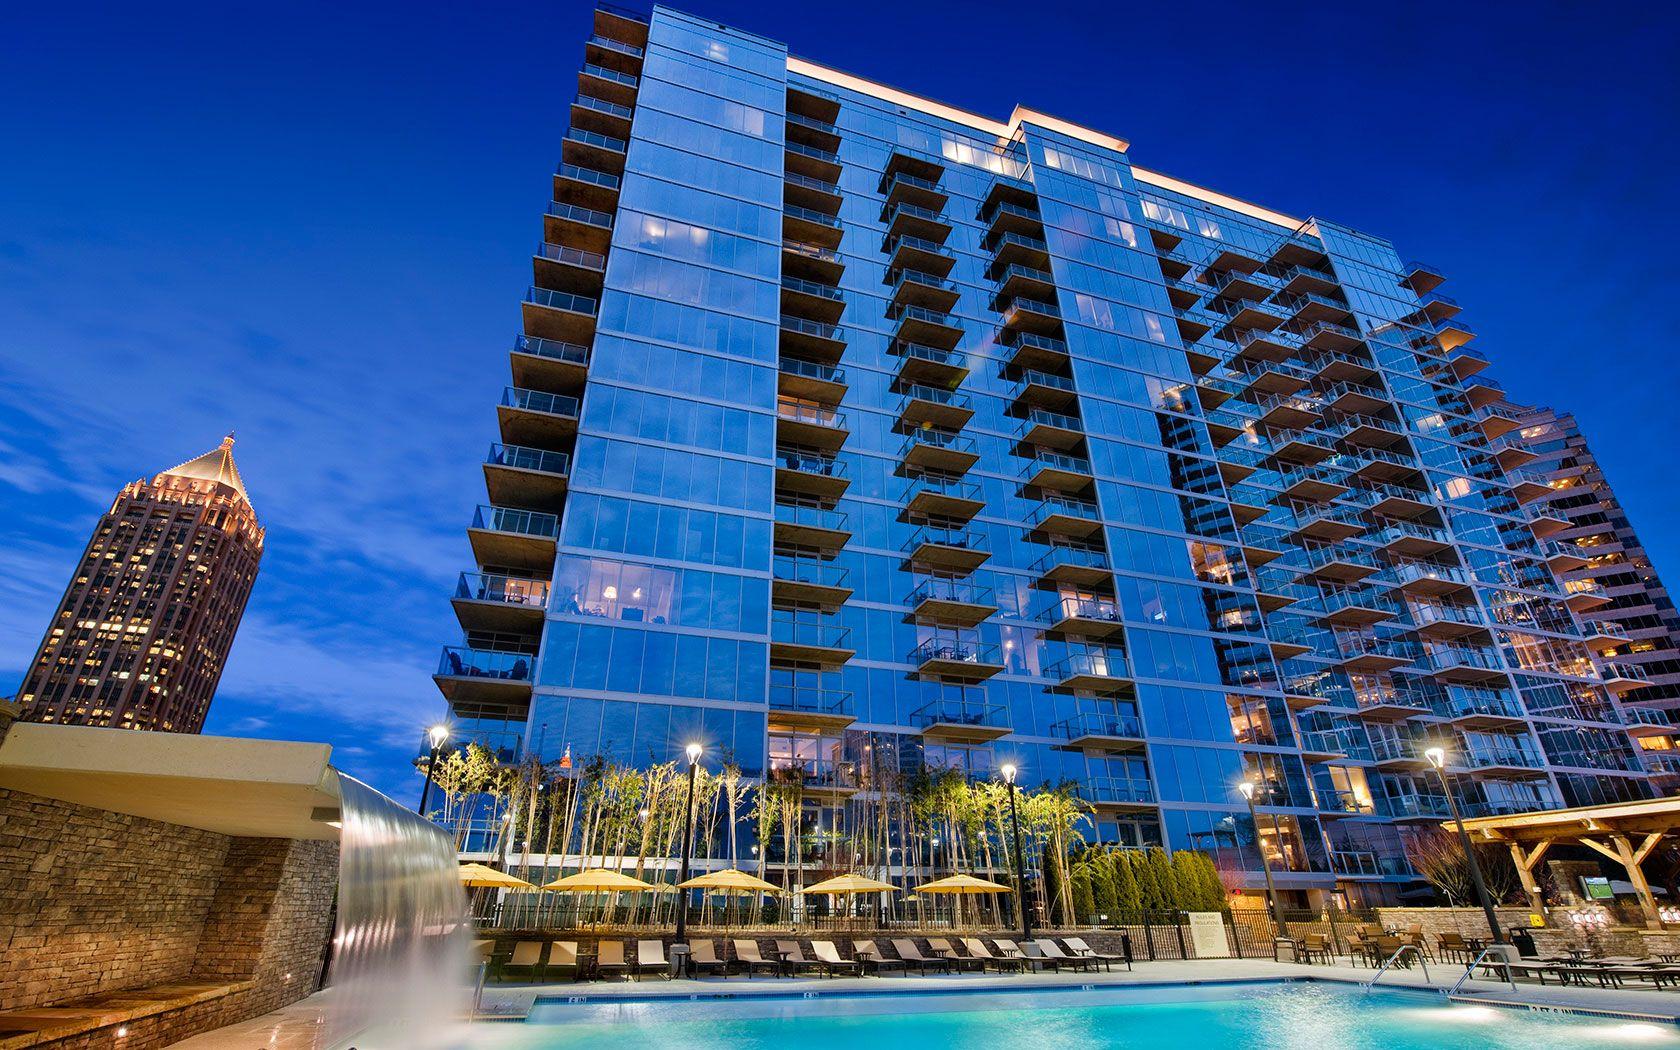 77 12th - Luxury High-Rise Apartments - Midtown Atlanta | Atlanta <3 ...